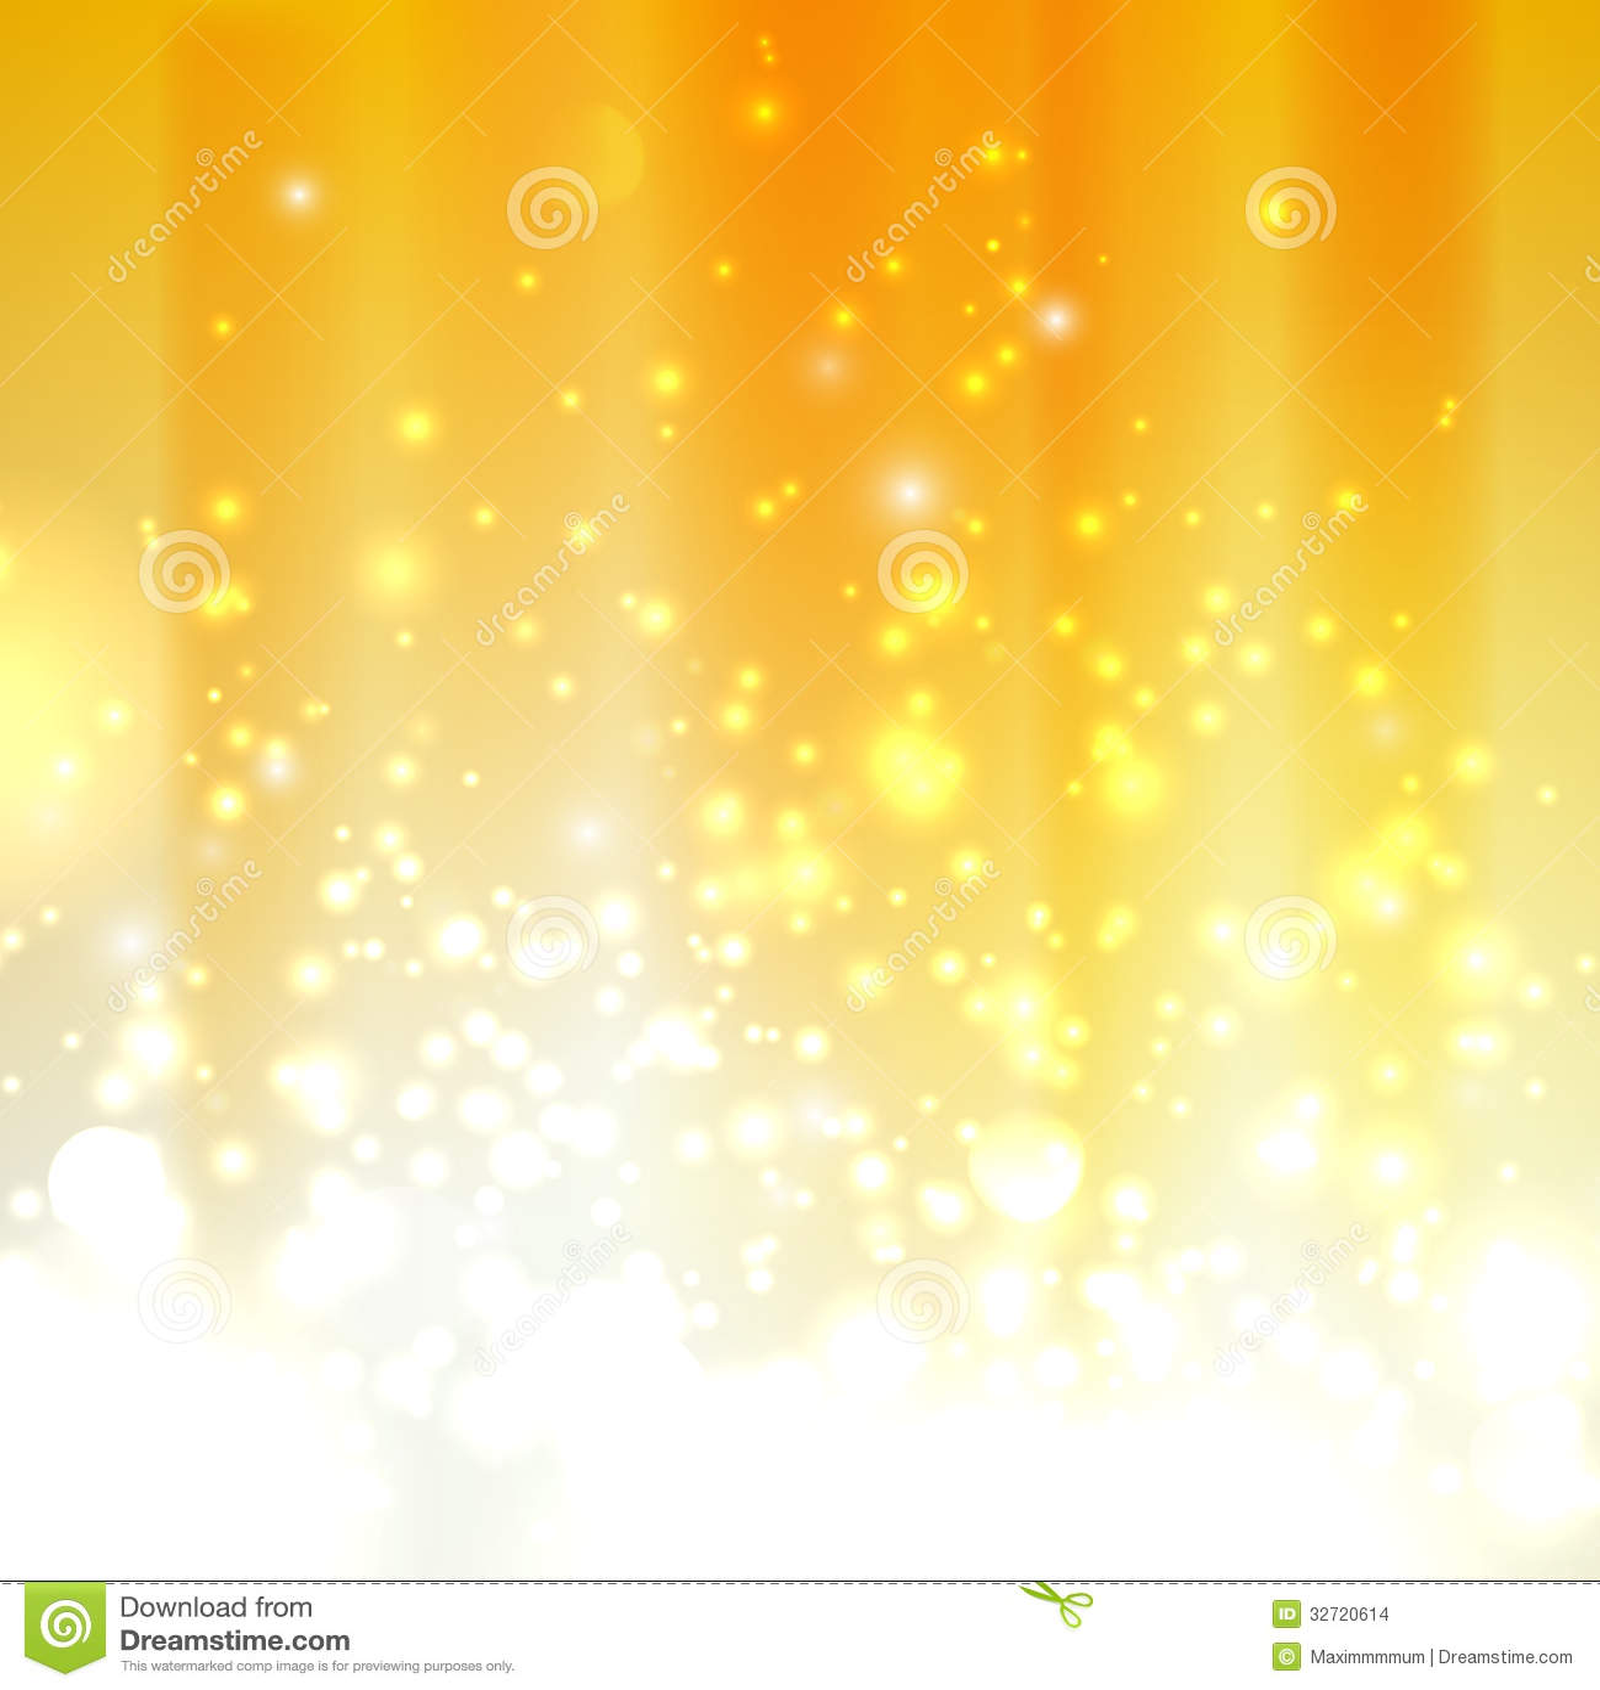 Orange Background With Sparkles Stock Images - Image: 32720614